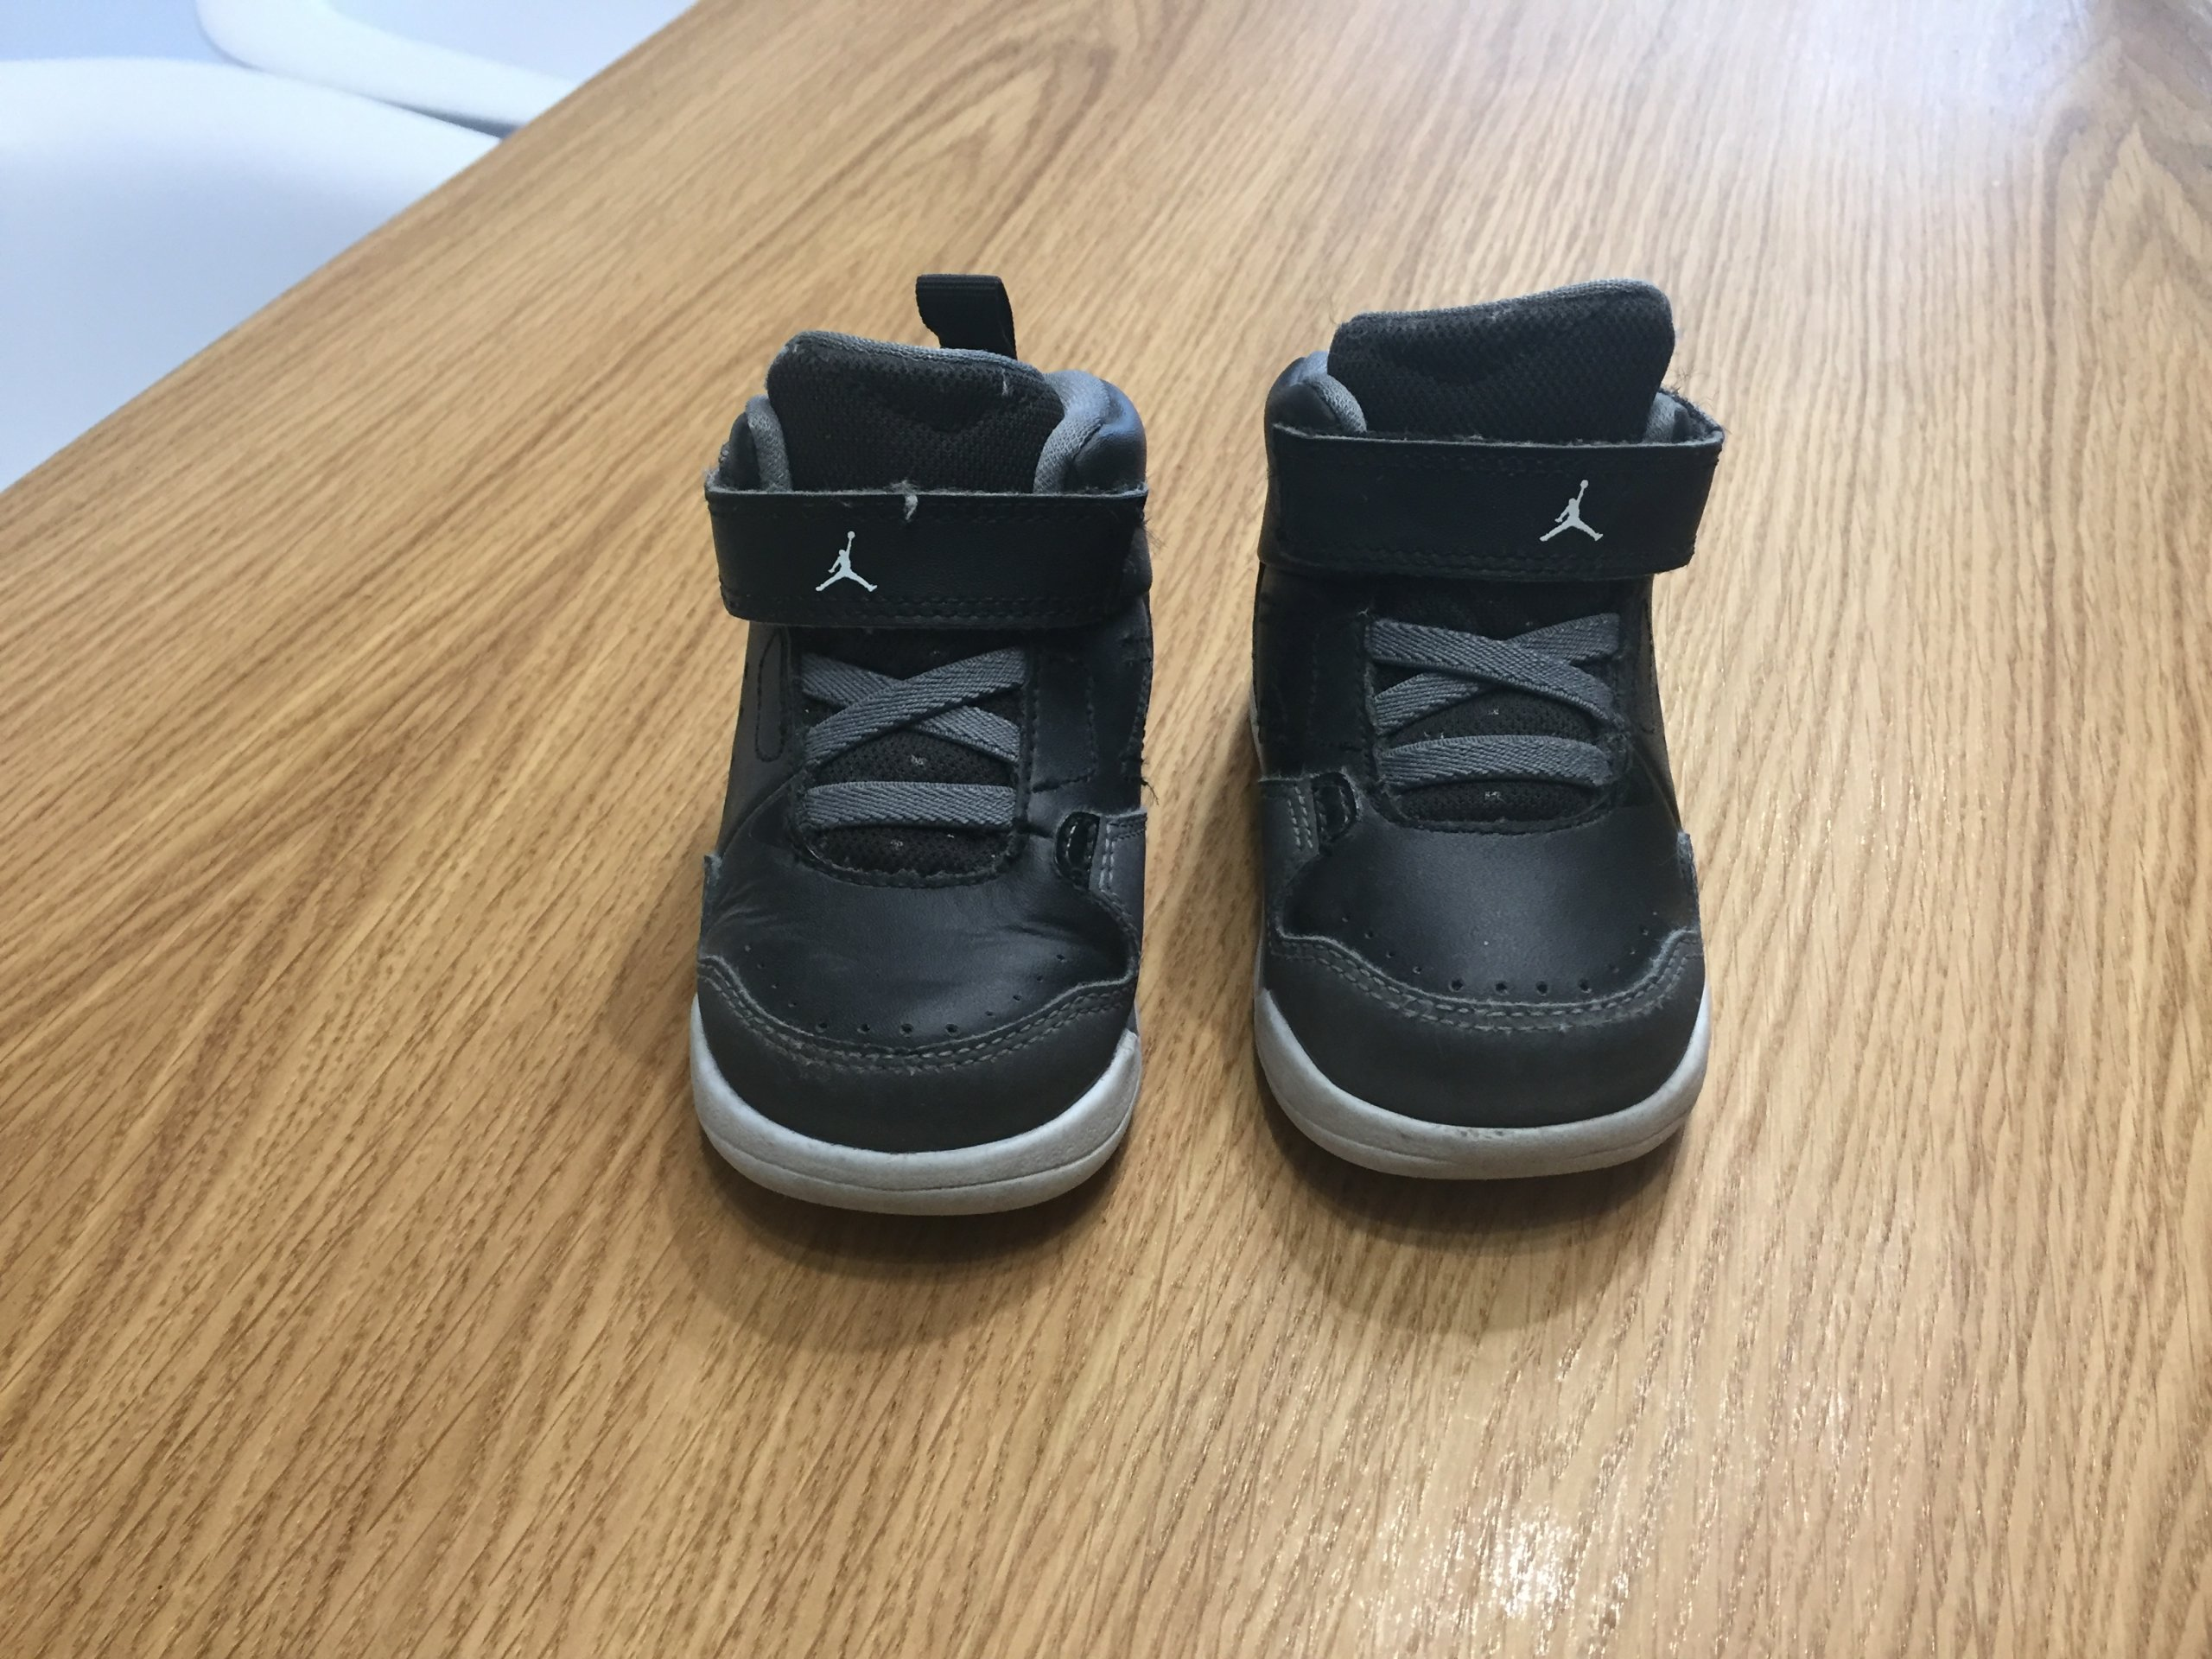 AIR JORDAN dla niemowlaka -  rozmiar 21 (11cm)